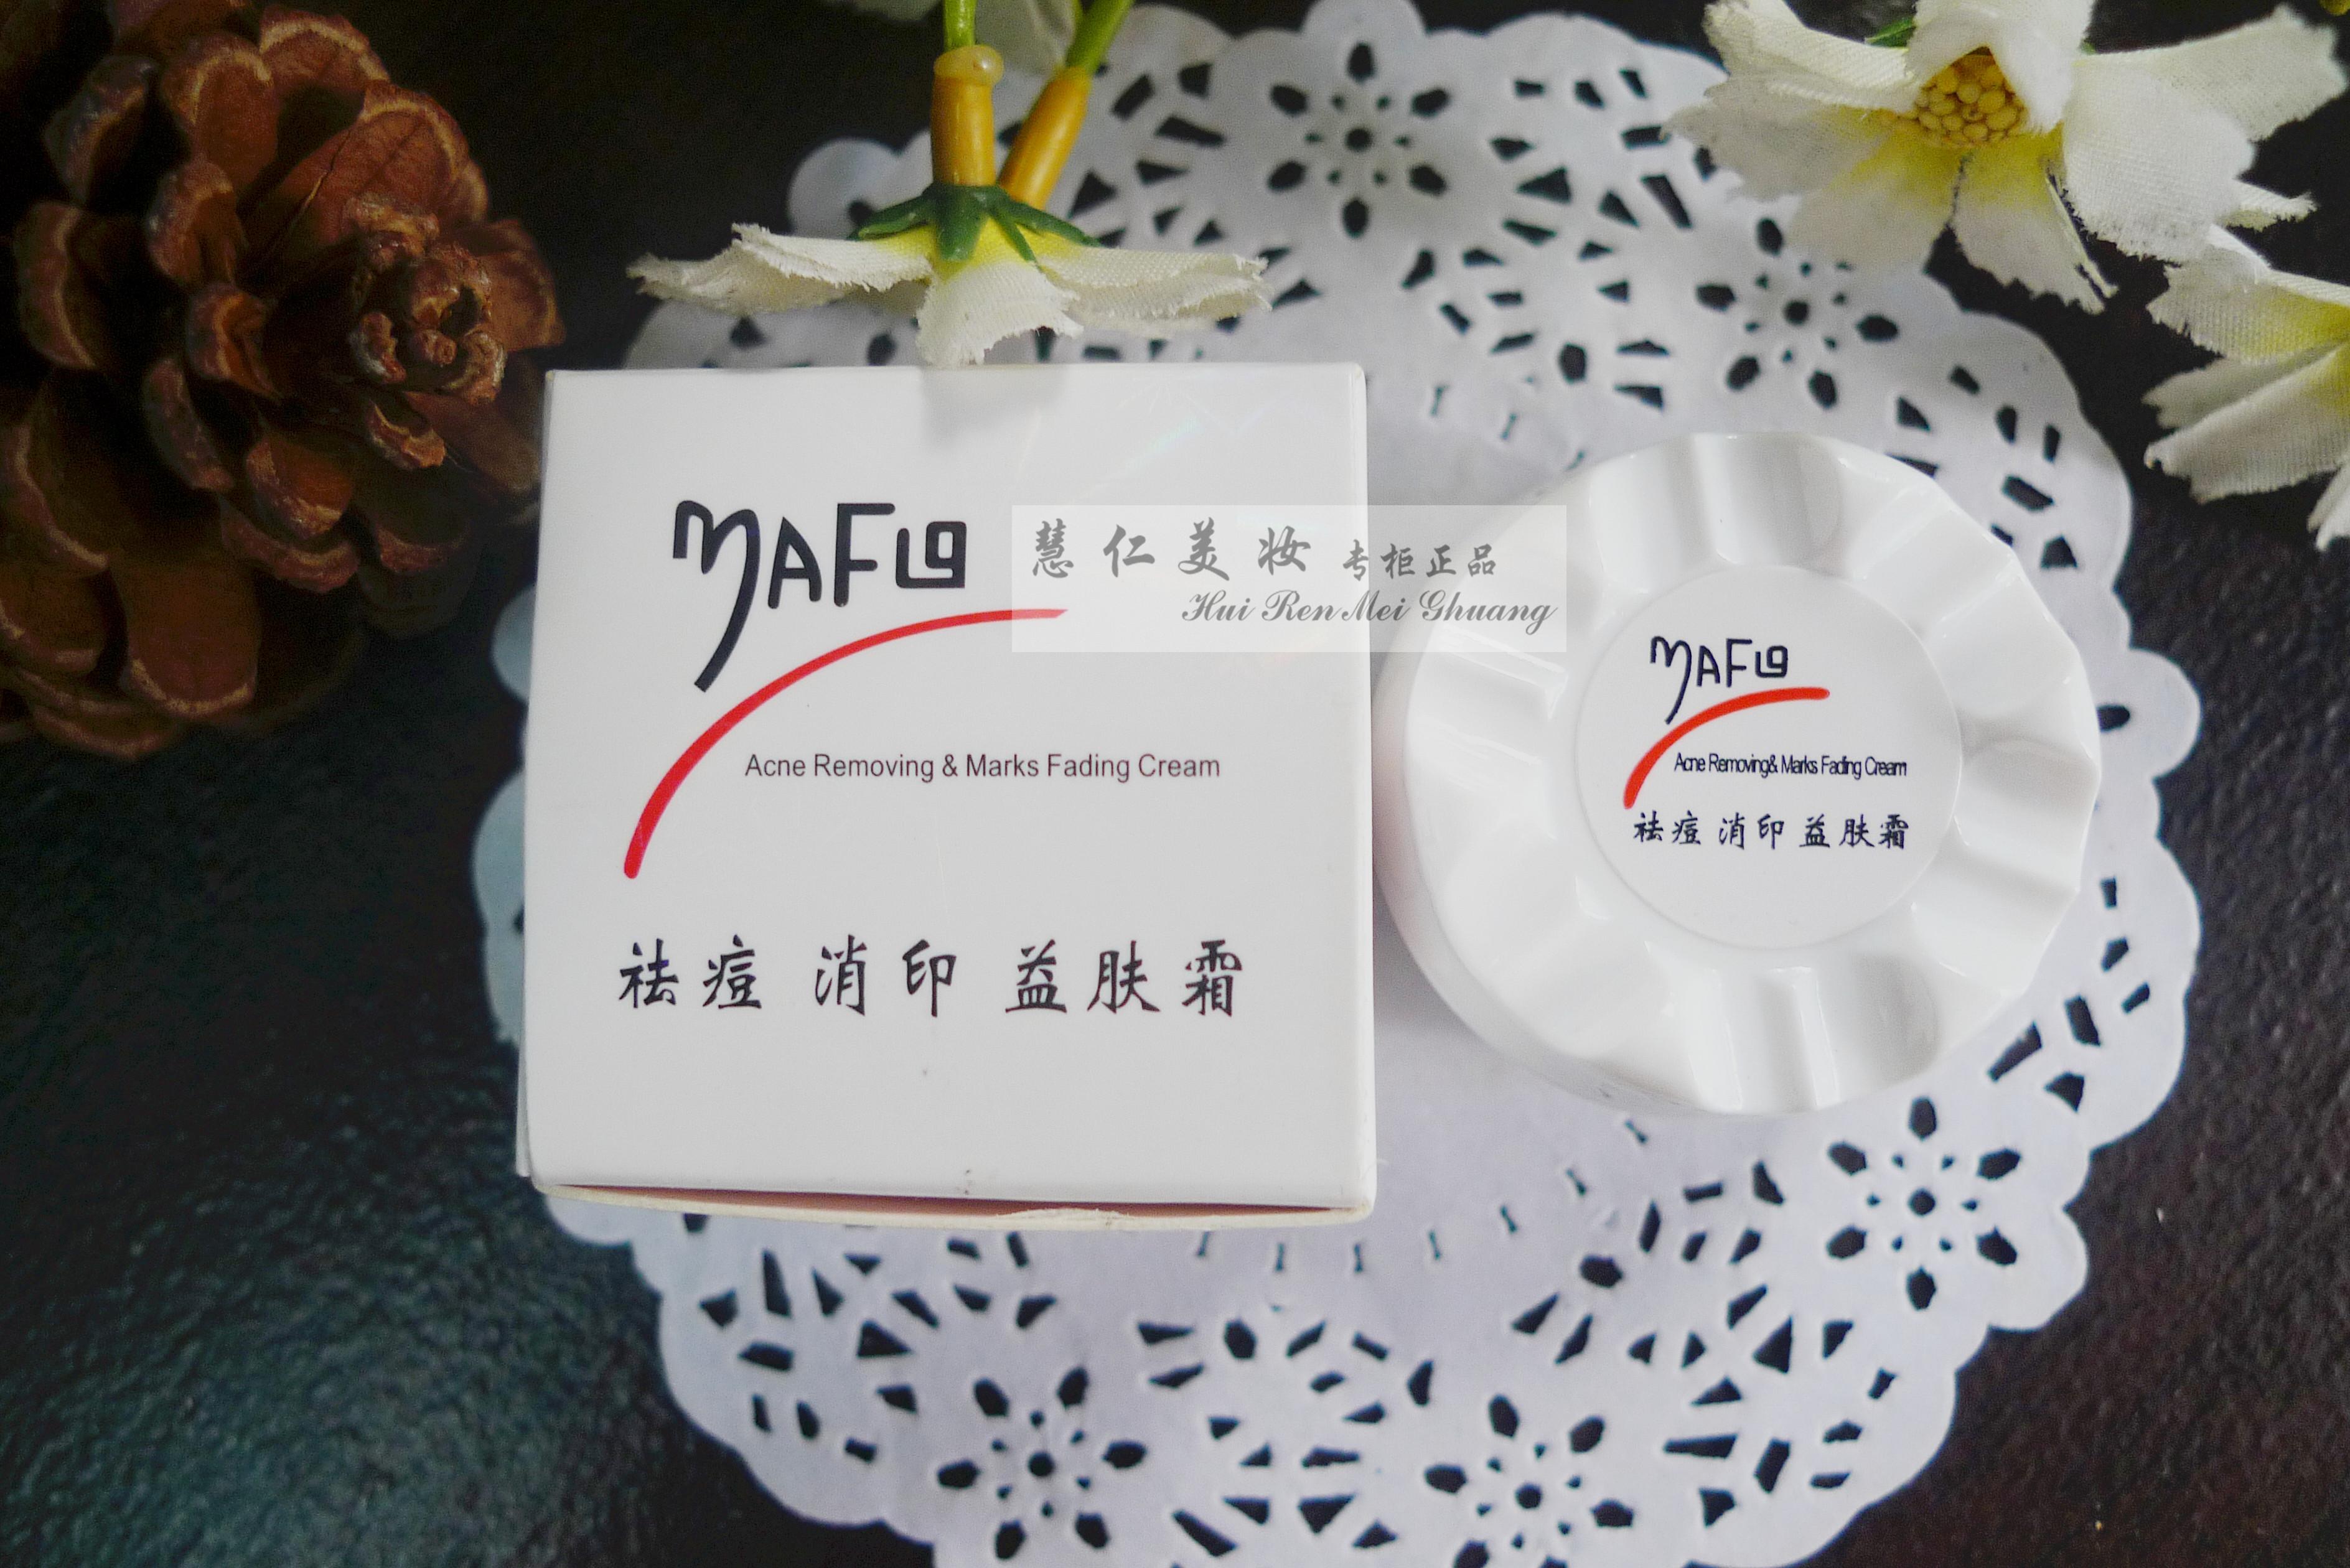 maflg台湾雅芙益肤霜10g 买4个包邮